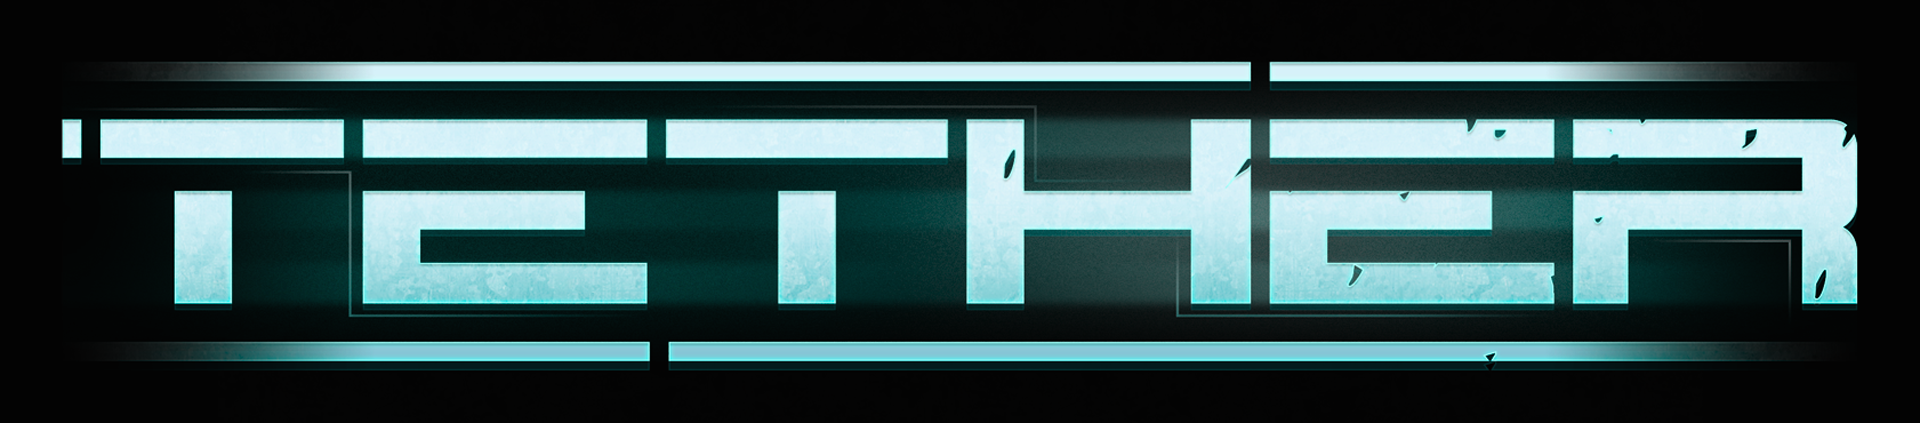 Tether Pre-Alpha